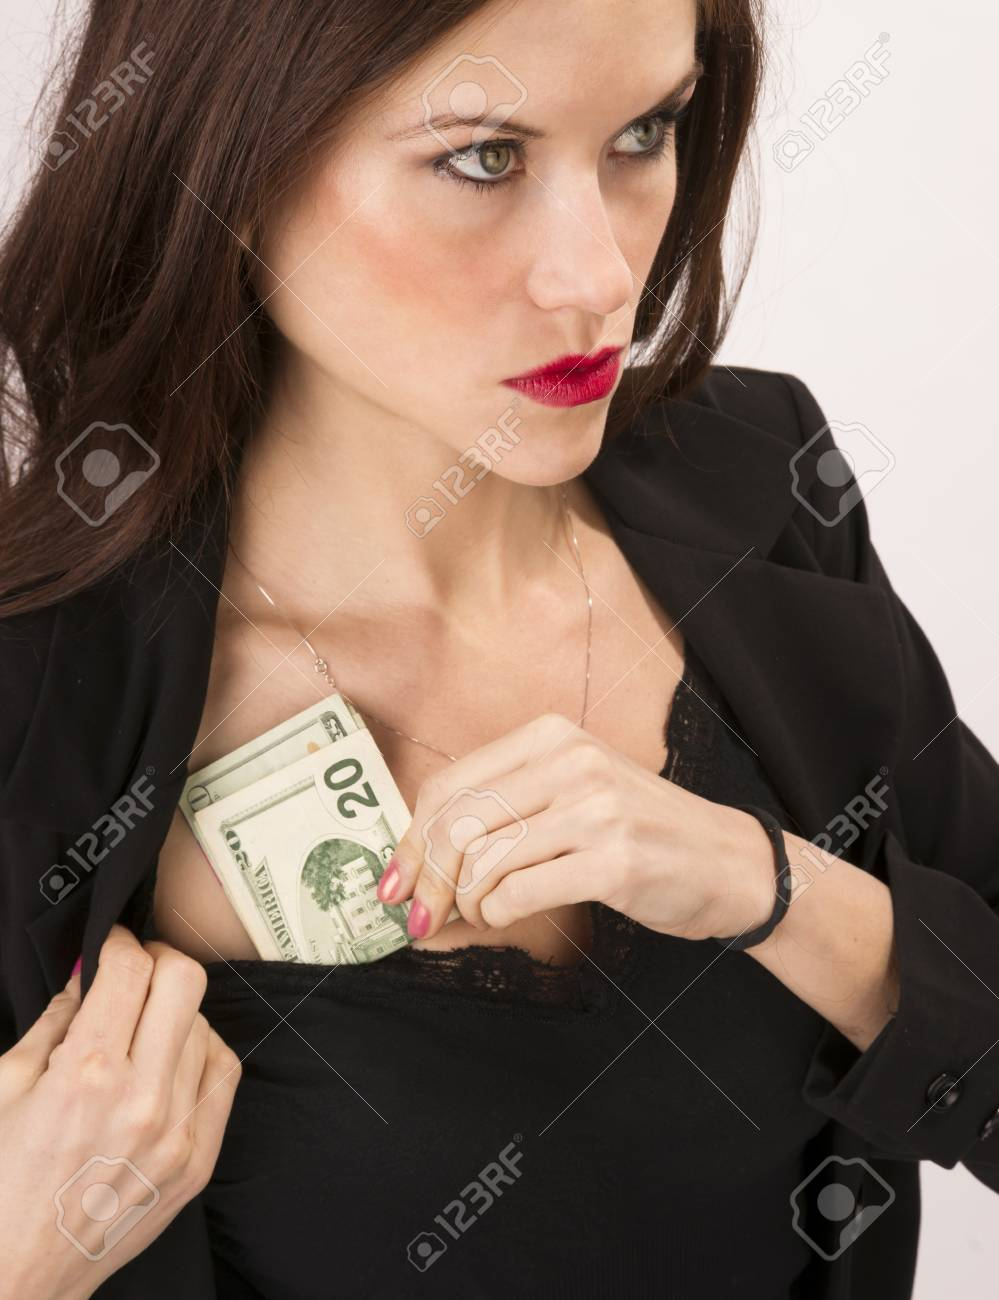 A good looking brunette woman stuffs money into her shirt Stock Photo - 23184442